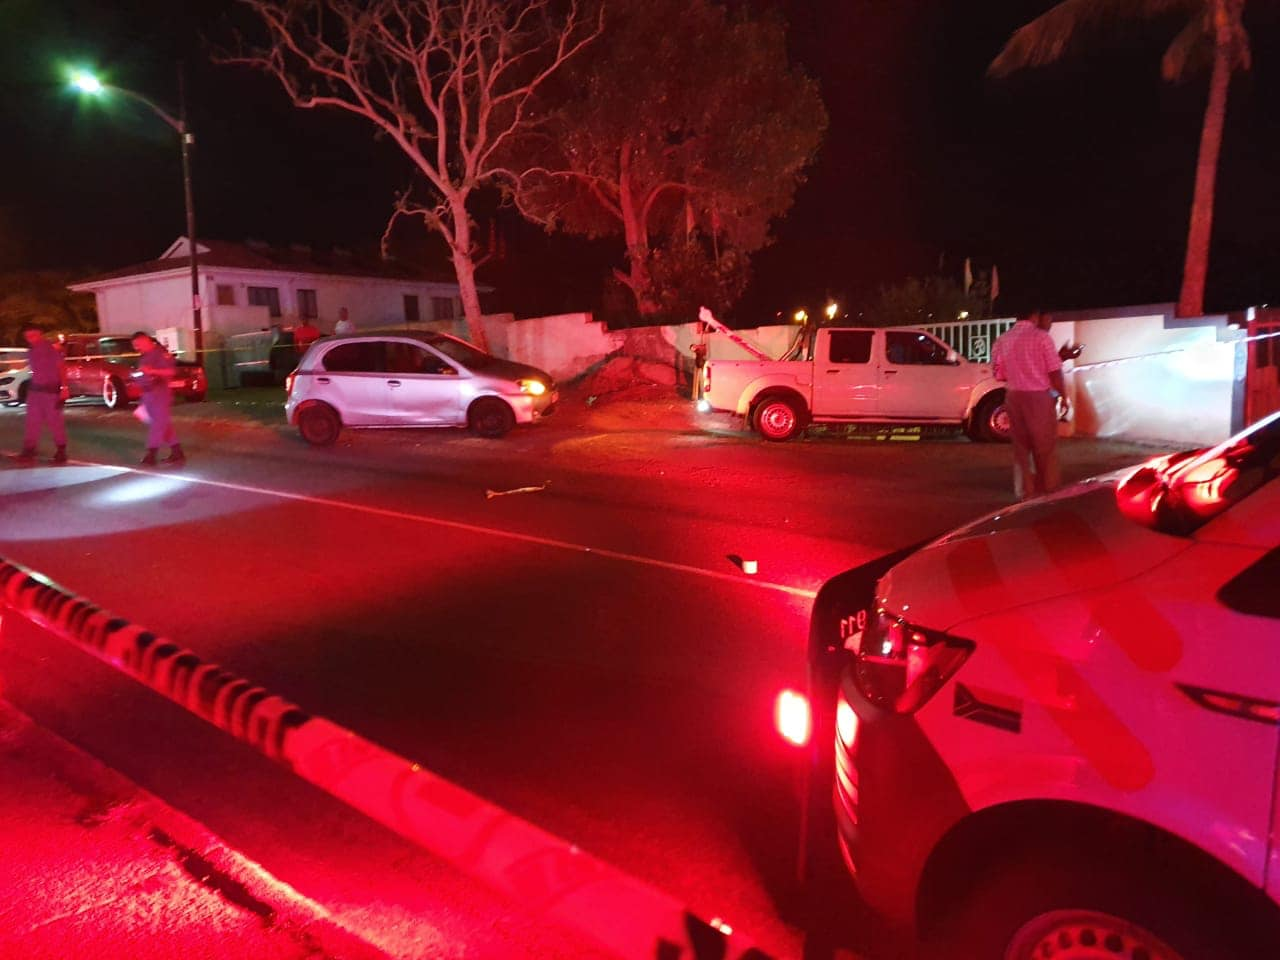 Tow truck operator murdered in Phoenix